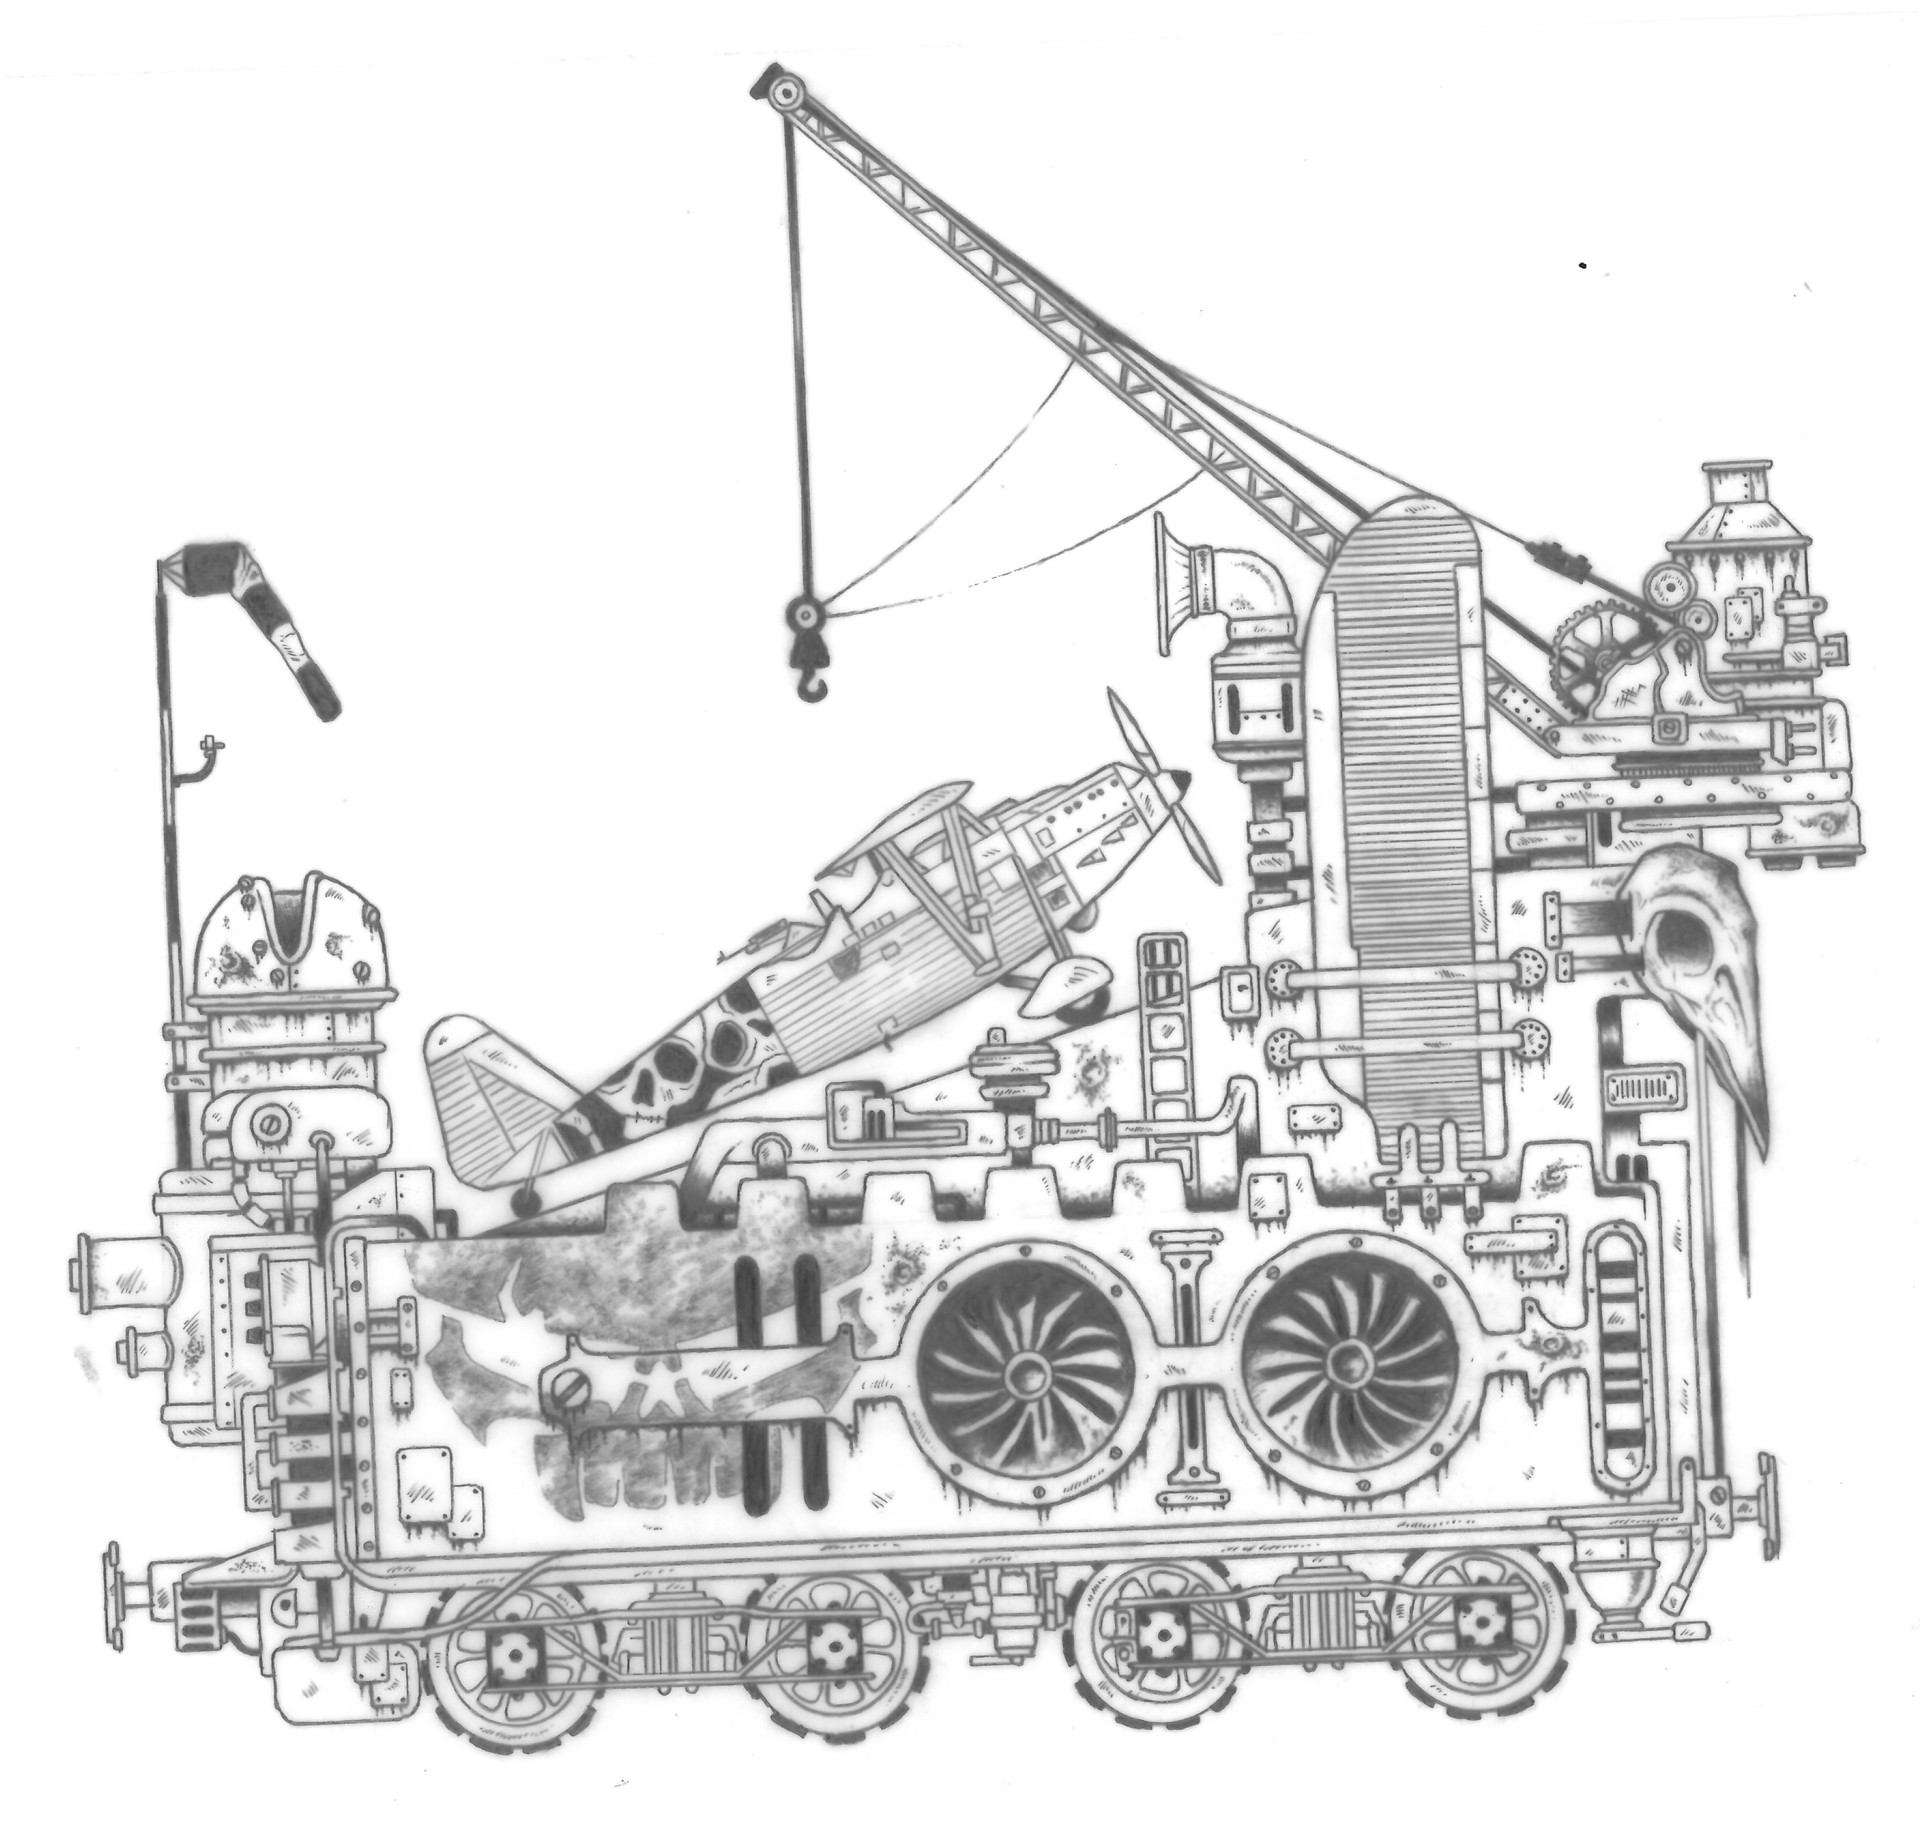 Sven Grabow Detailed Concept Work Of Land Train For Alternative Ad Mad Max Engine Diagram Spnog0116102807030